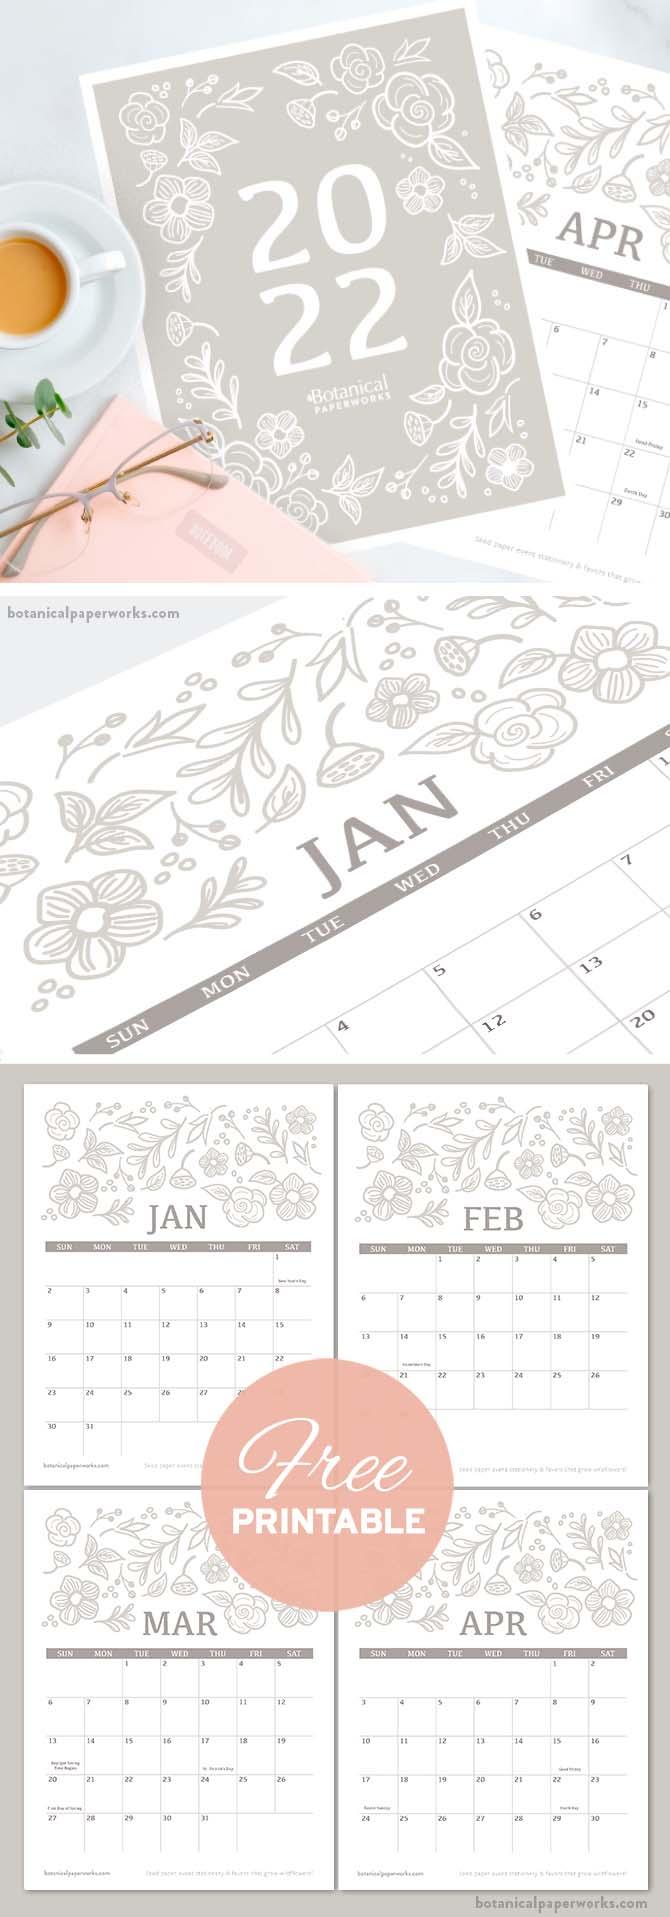 free printable 2022 calendars with a botanical design